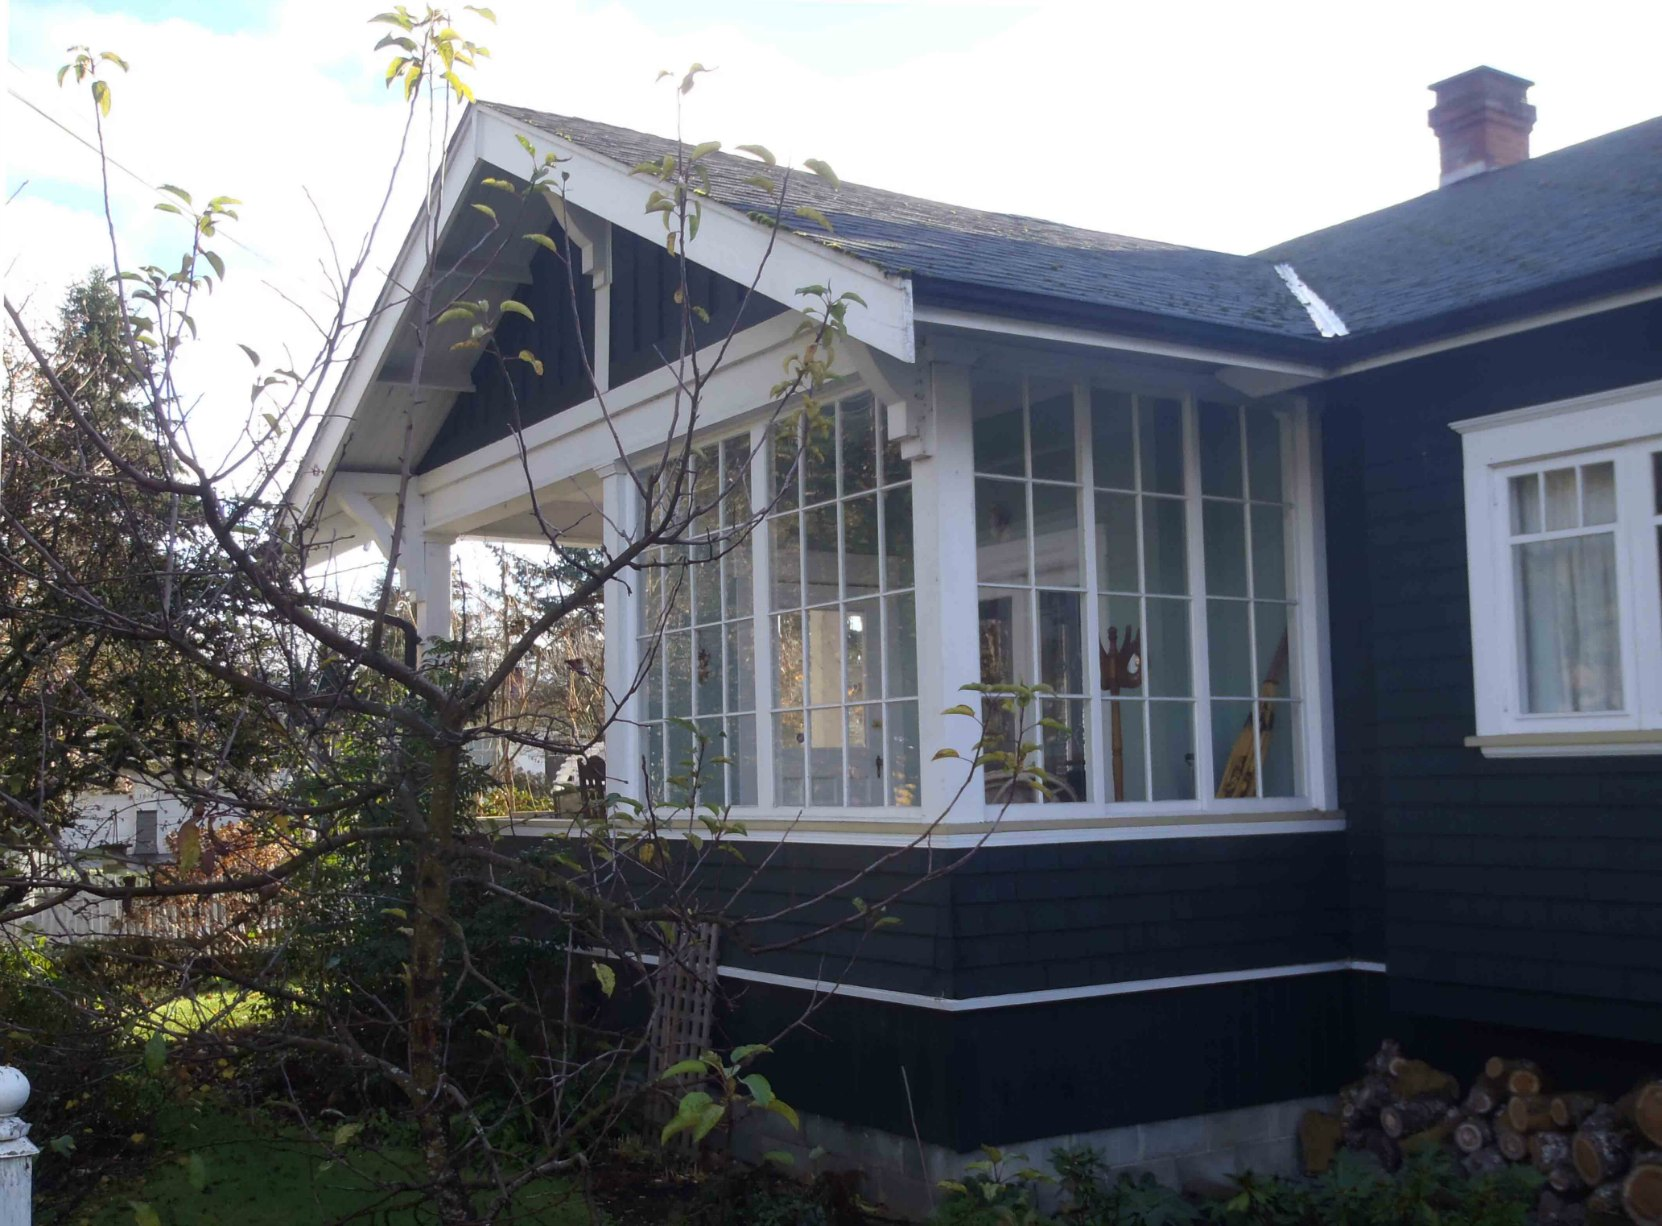 1081 Holmes Street (porch detail), built circa 1912 for Matthias Kirkwood McMillan